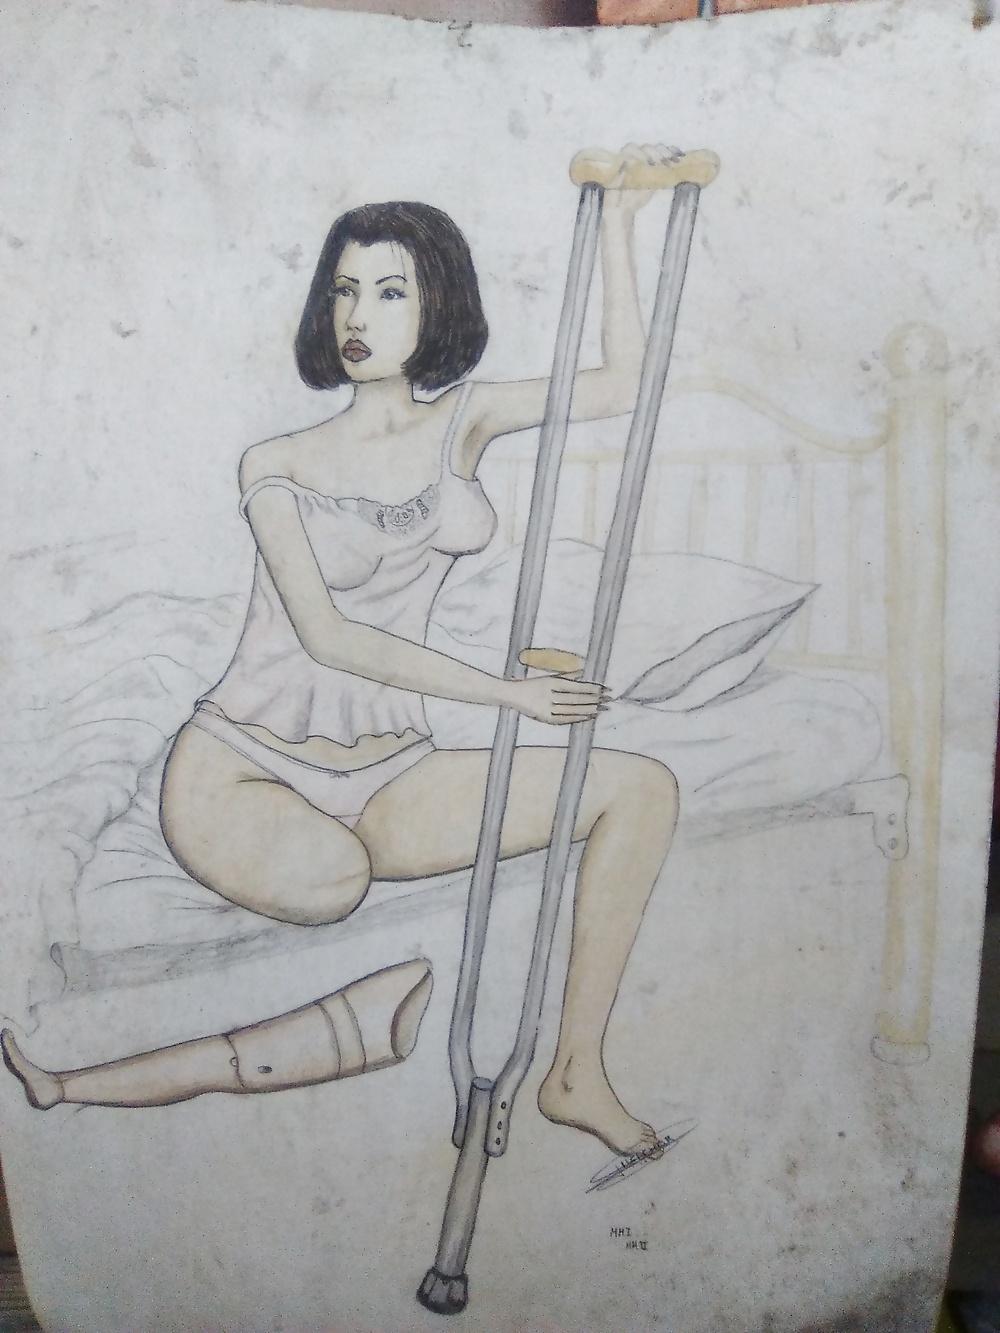 sexy-amputee-women-dancing-hot-anal-fist-fucking-slut-load